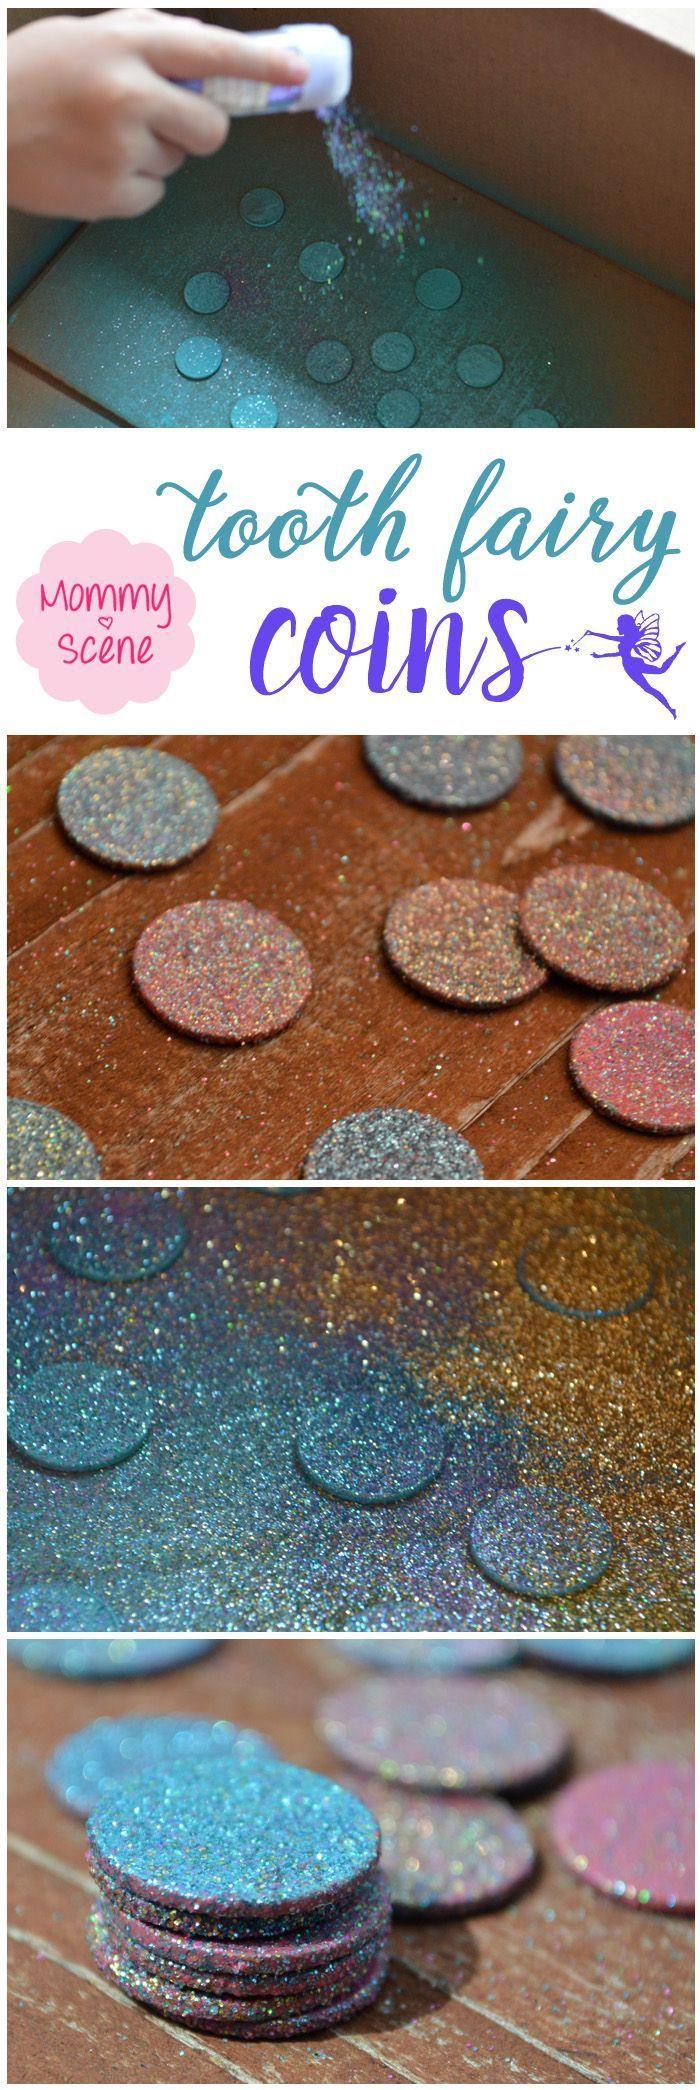 Glittery DIY tooth fairy coins kids' craft